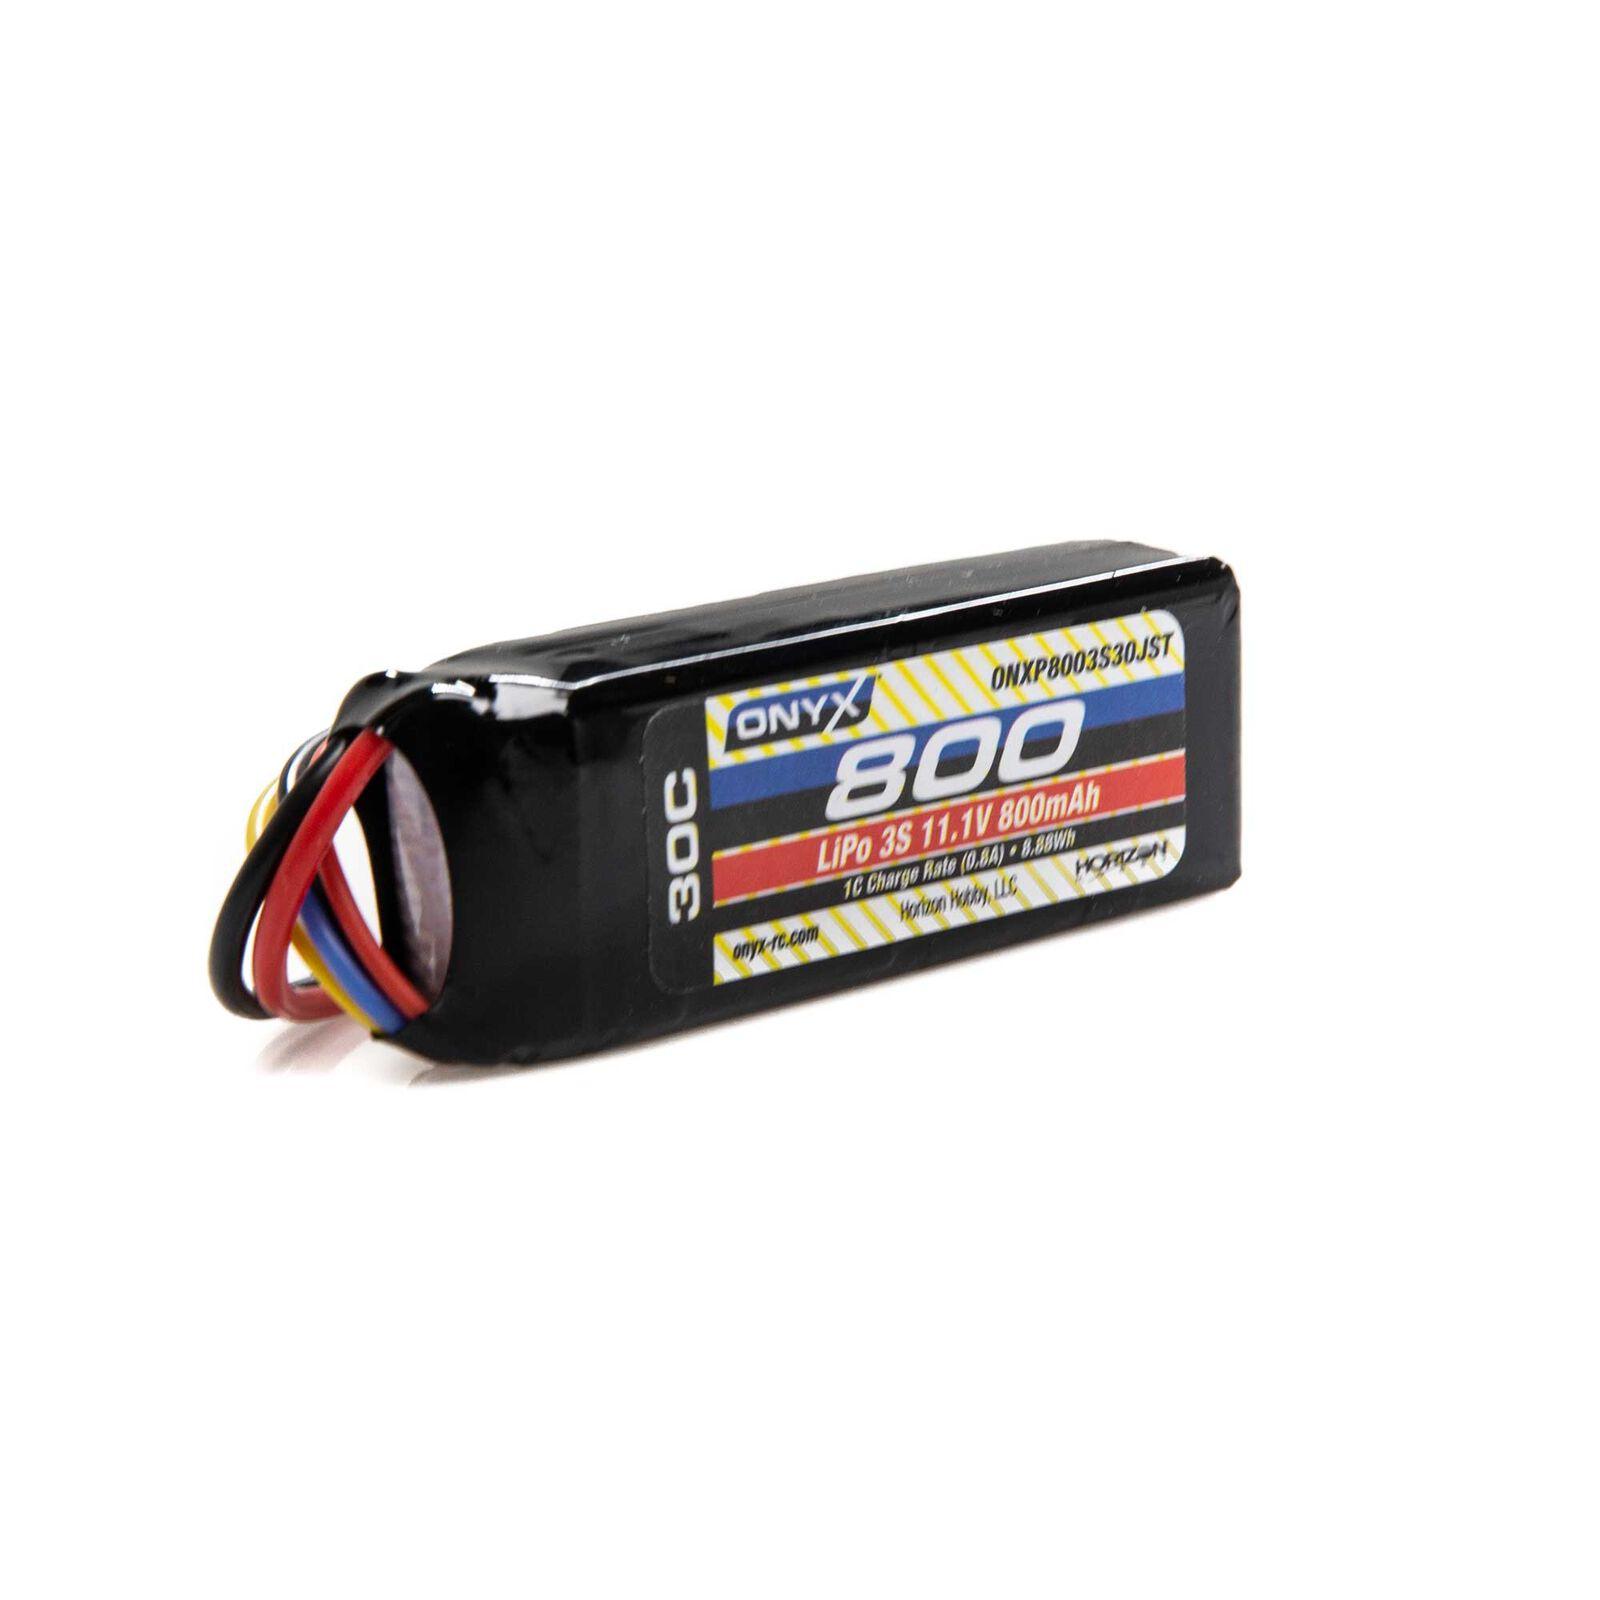 11.1V 800mAh 3S 30C LiPo Battery: JST